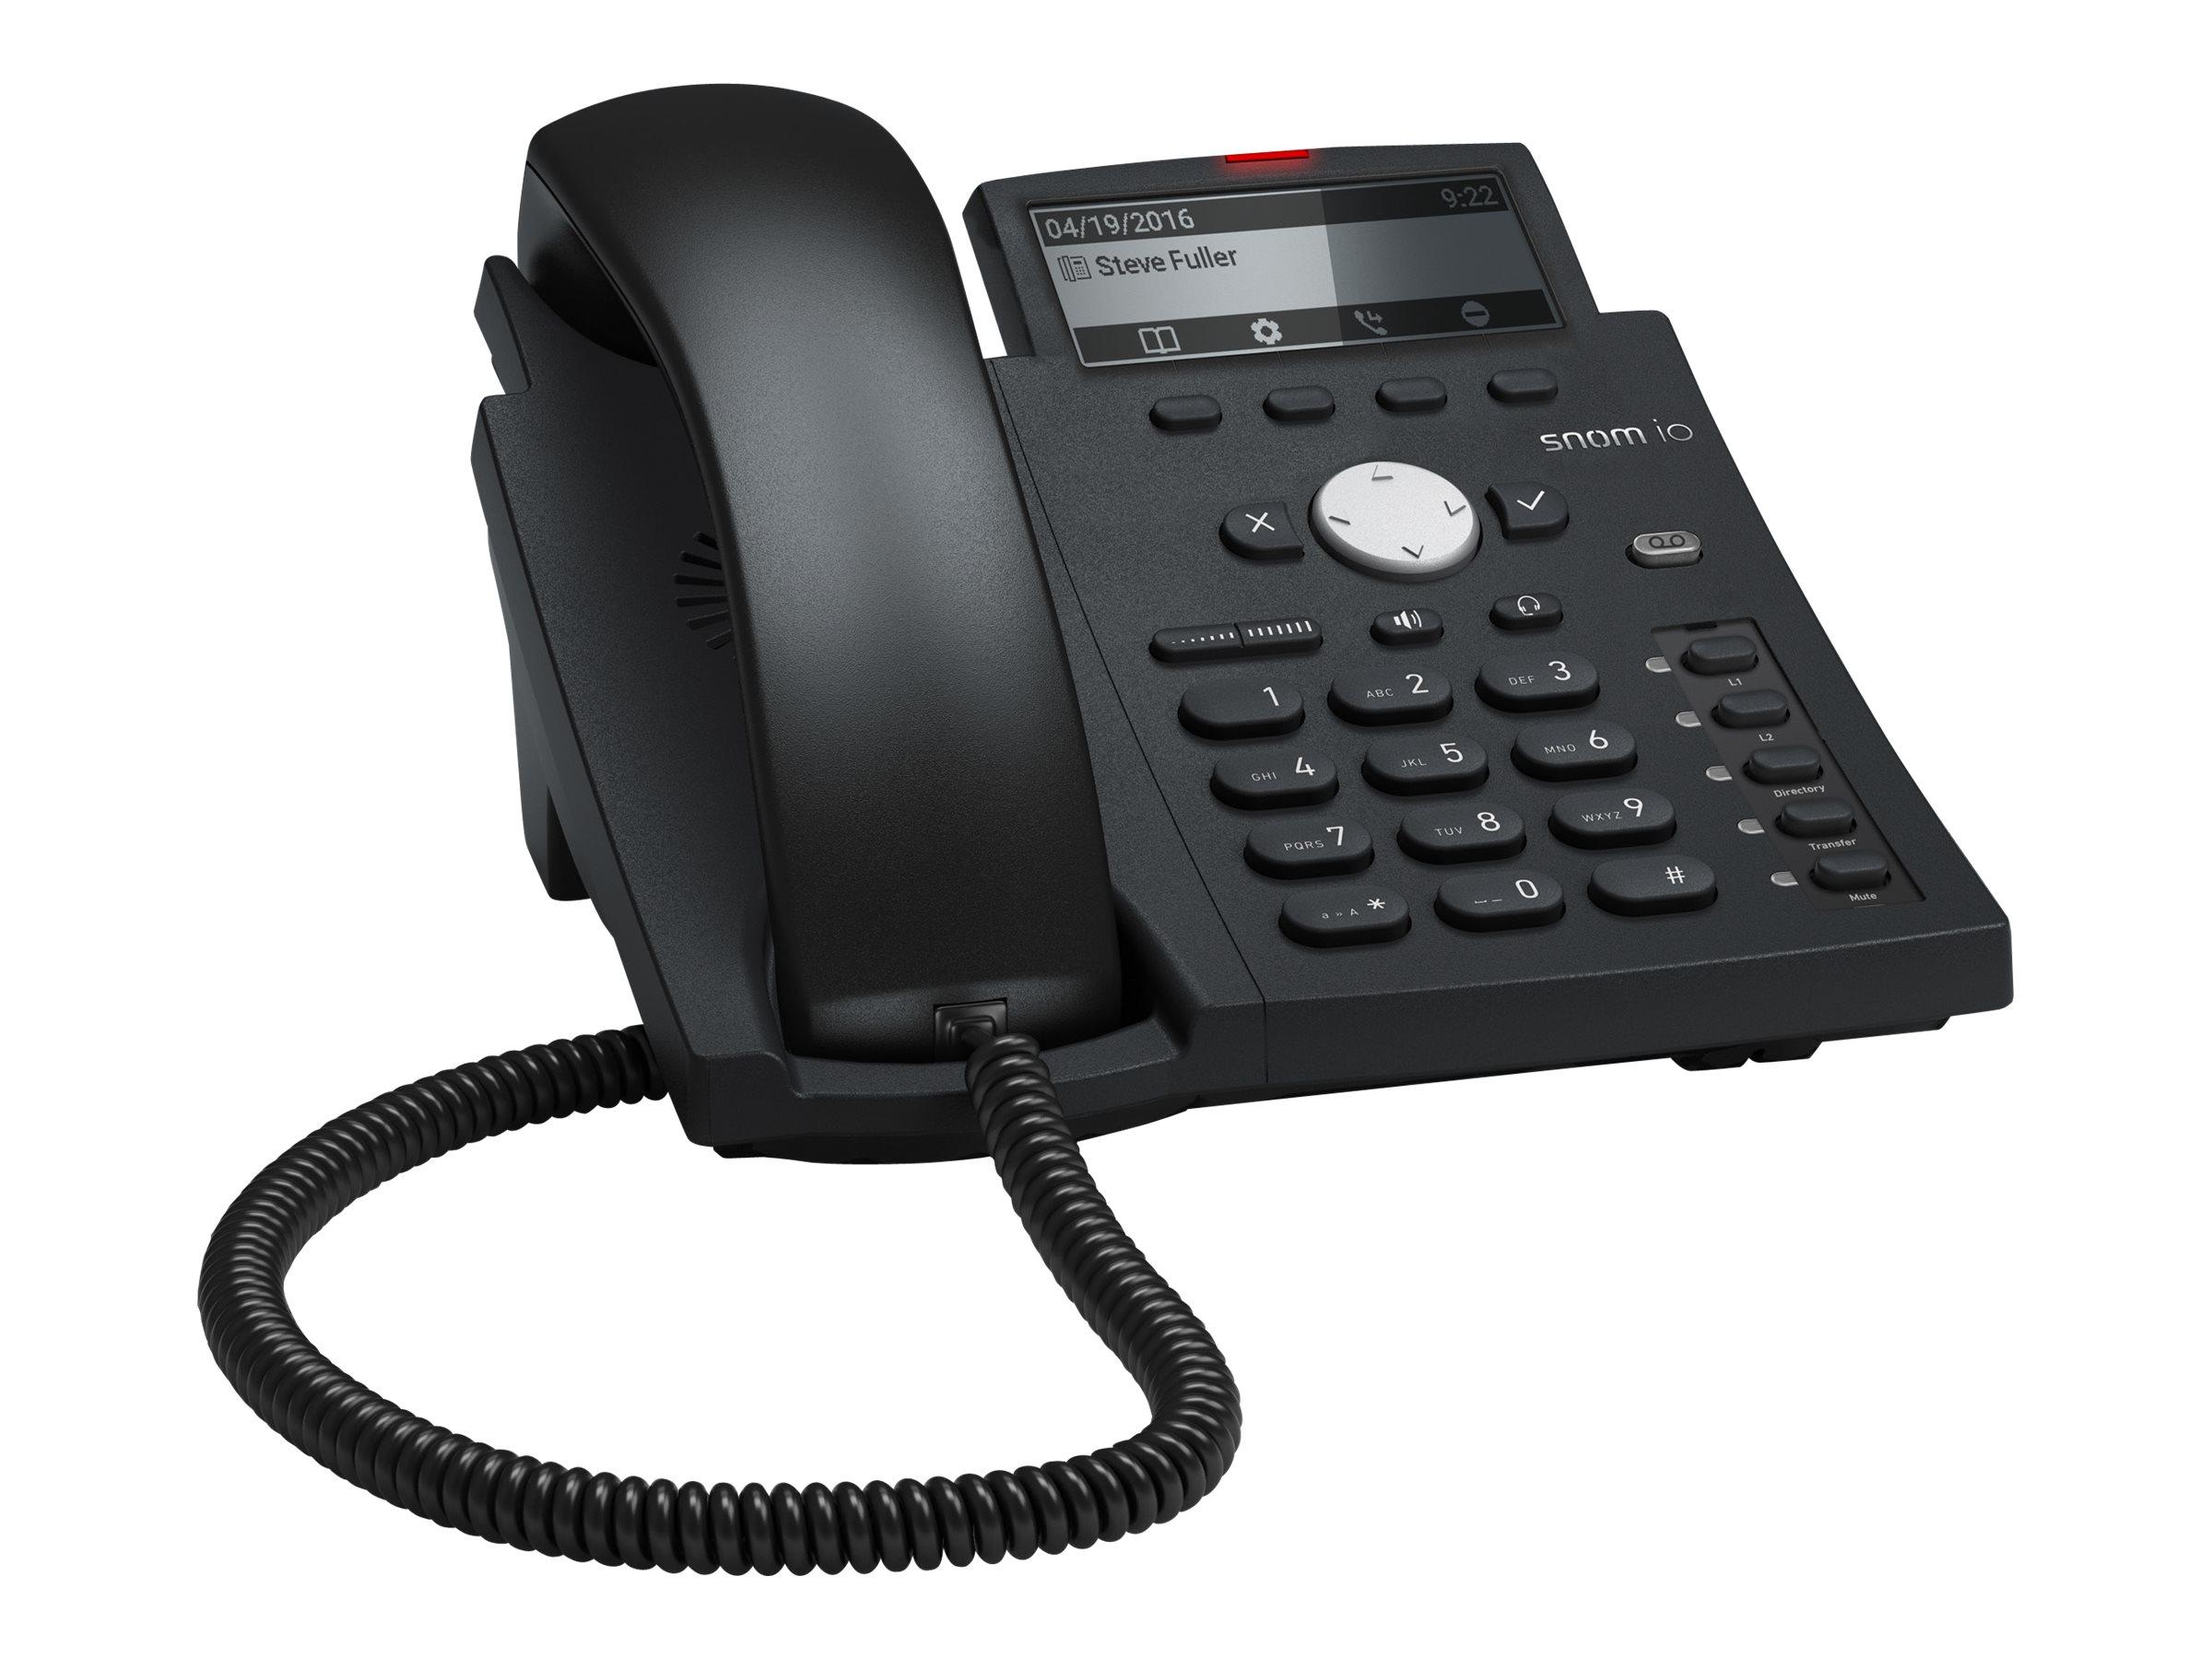 snom D315 - VoIP-Telefon - dreiweg Anruffunktion - SIP - 4 Leitungen - schwarz blau